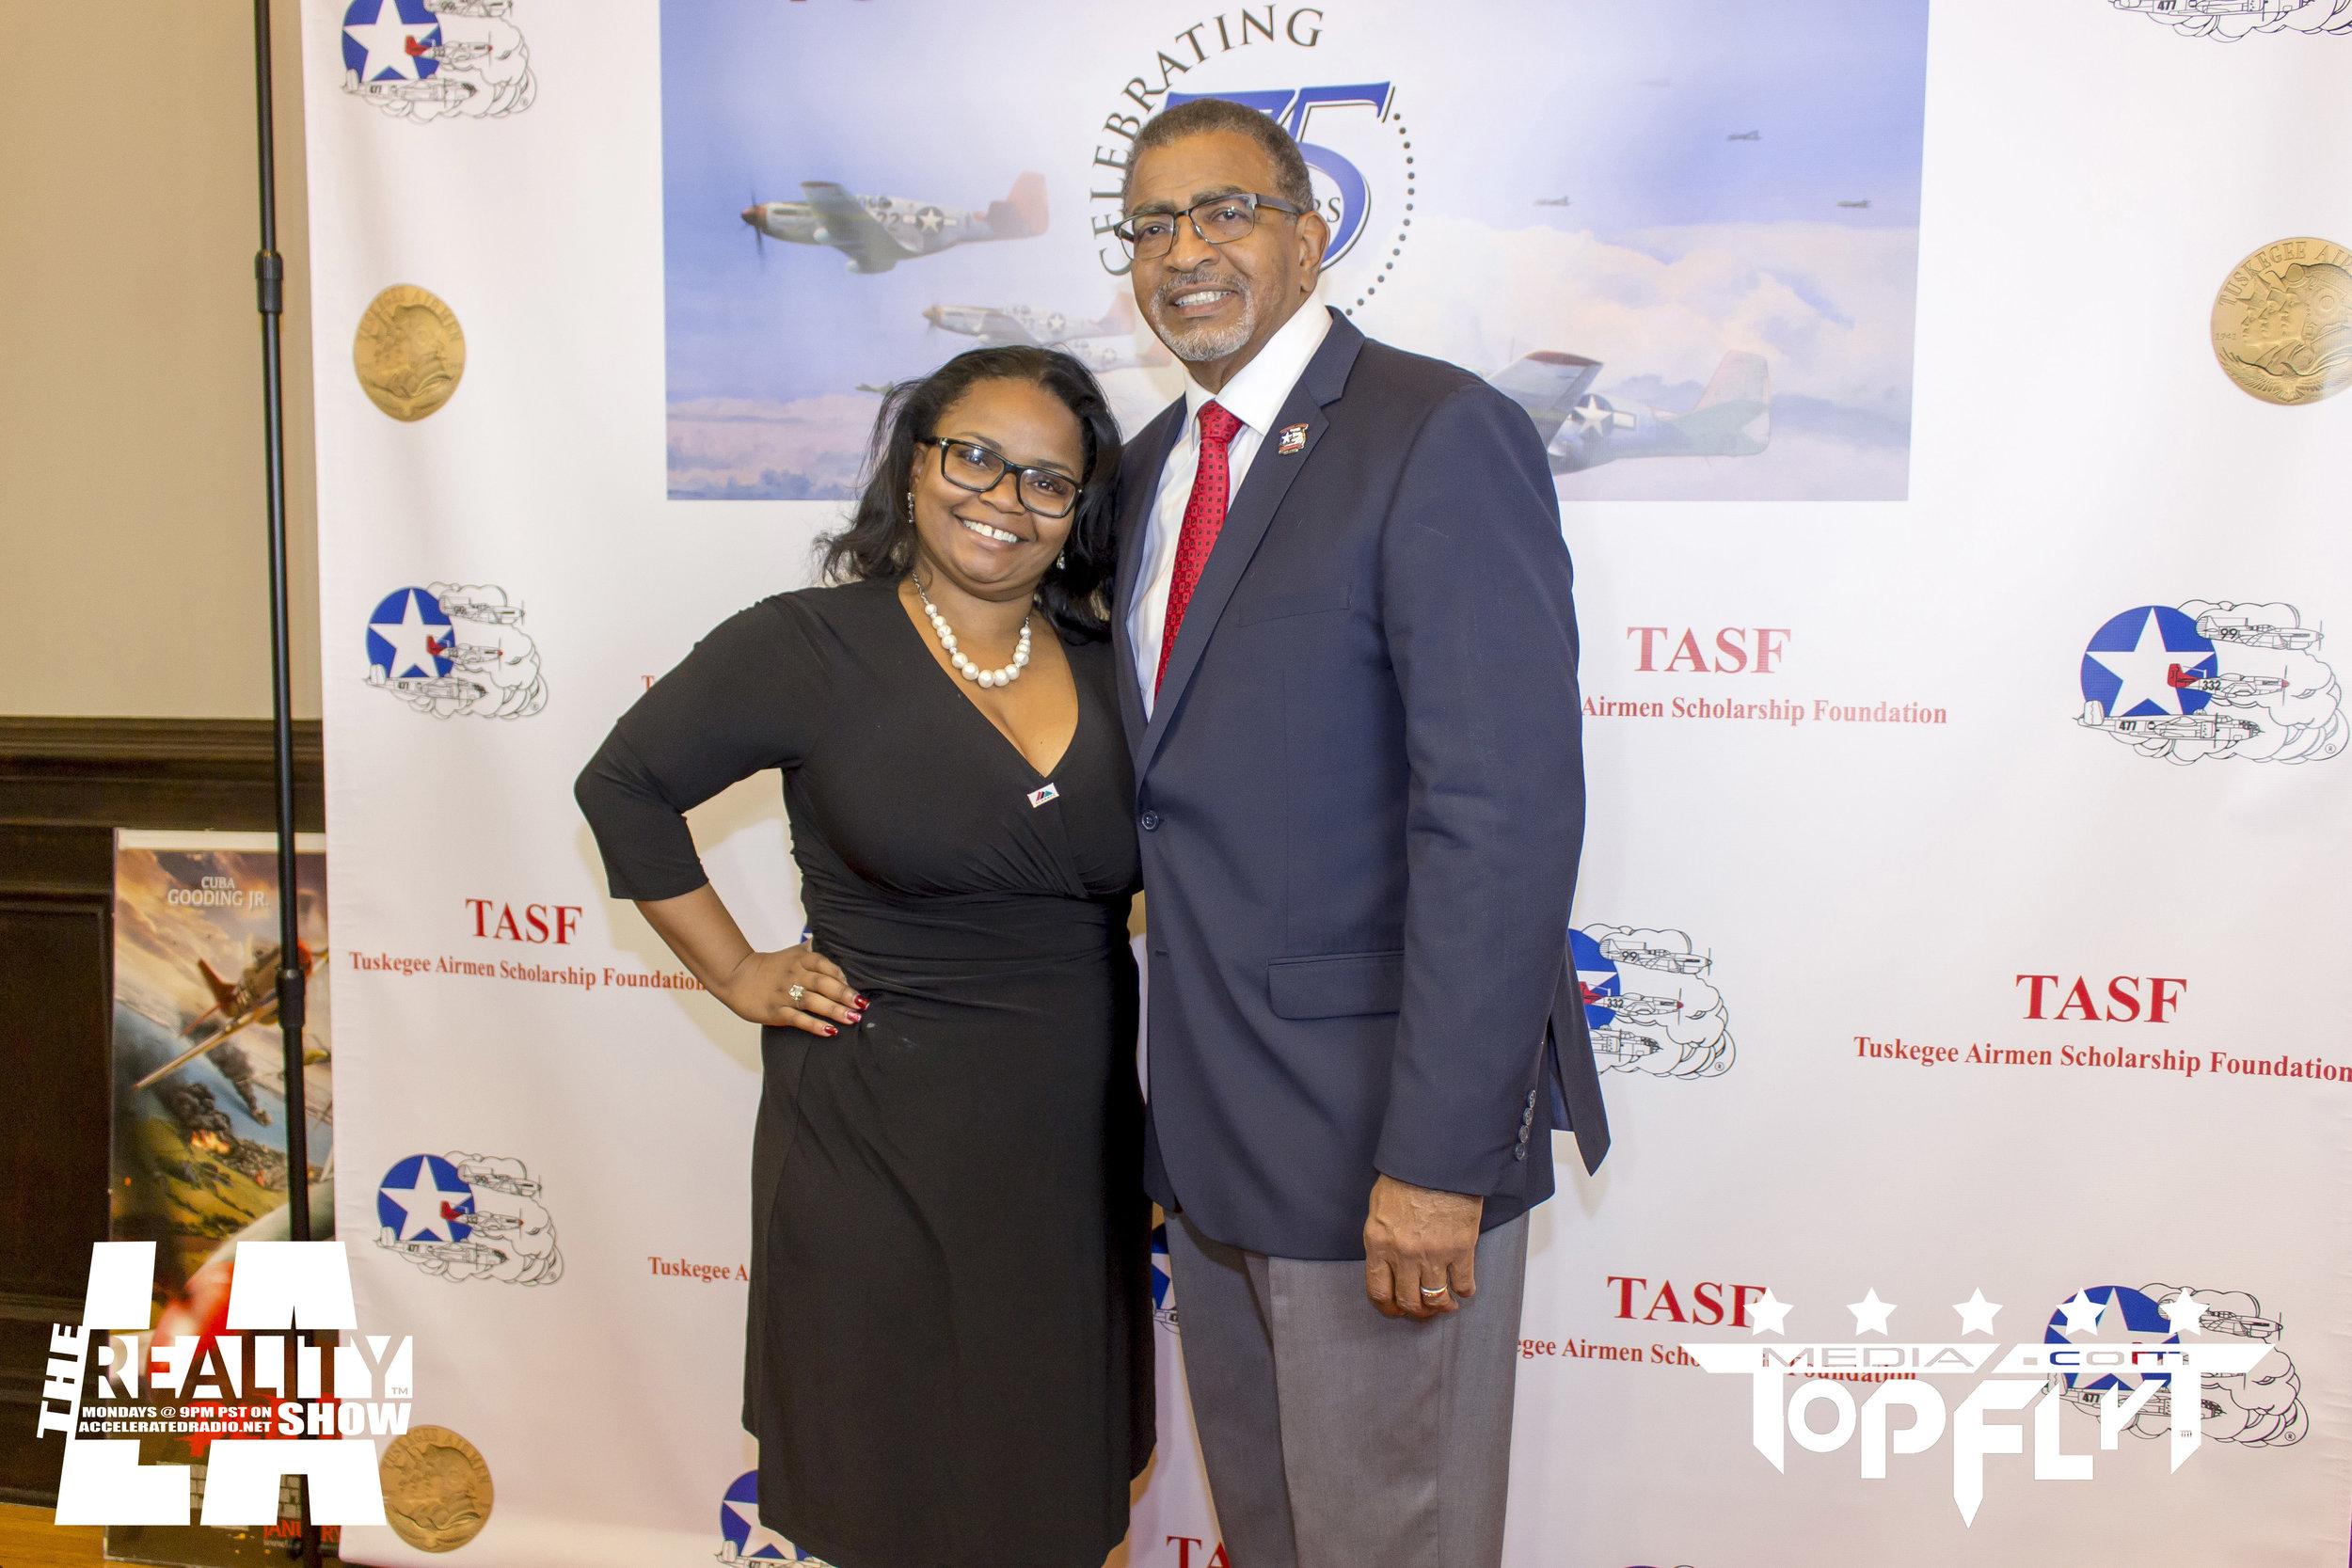 The Reality Show LA - Tuskegee Airmen 75th Anniversary VIP Reception_107.jpg